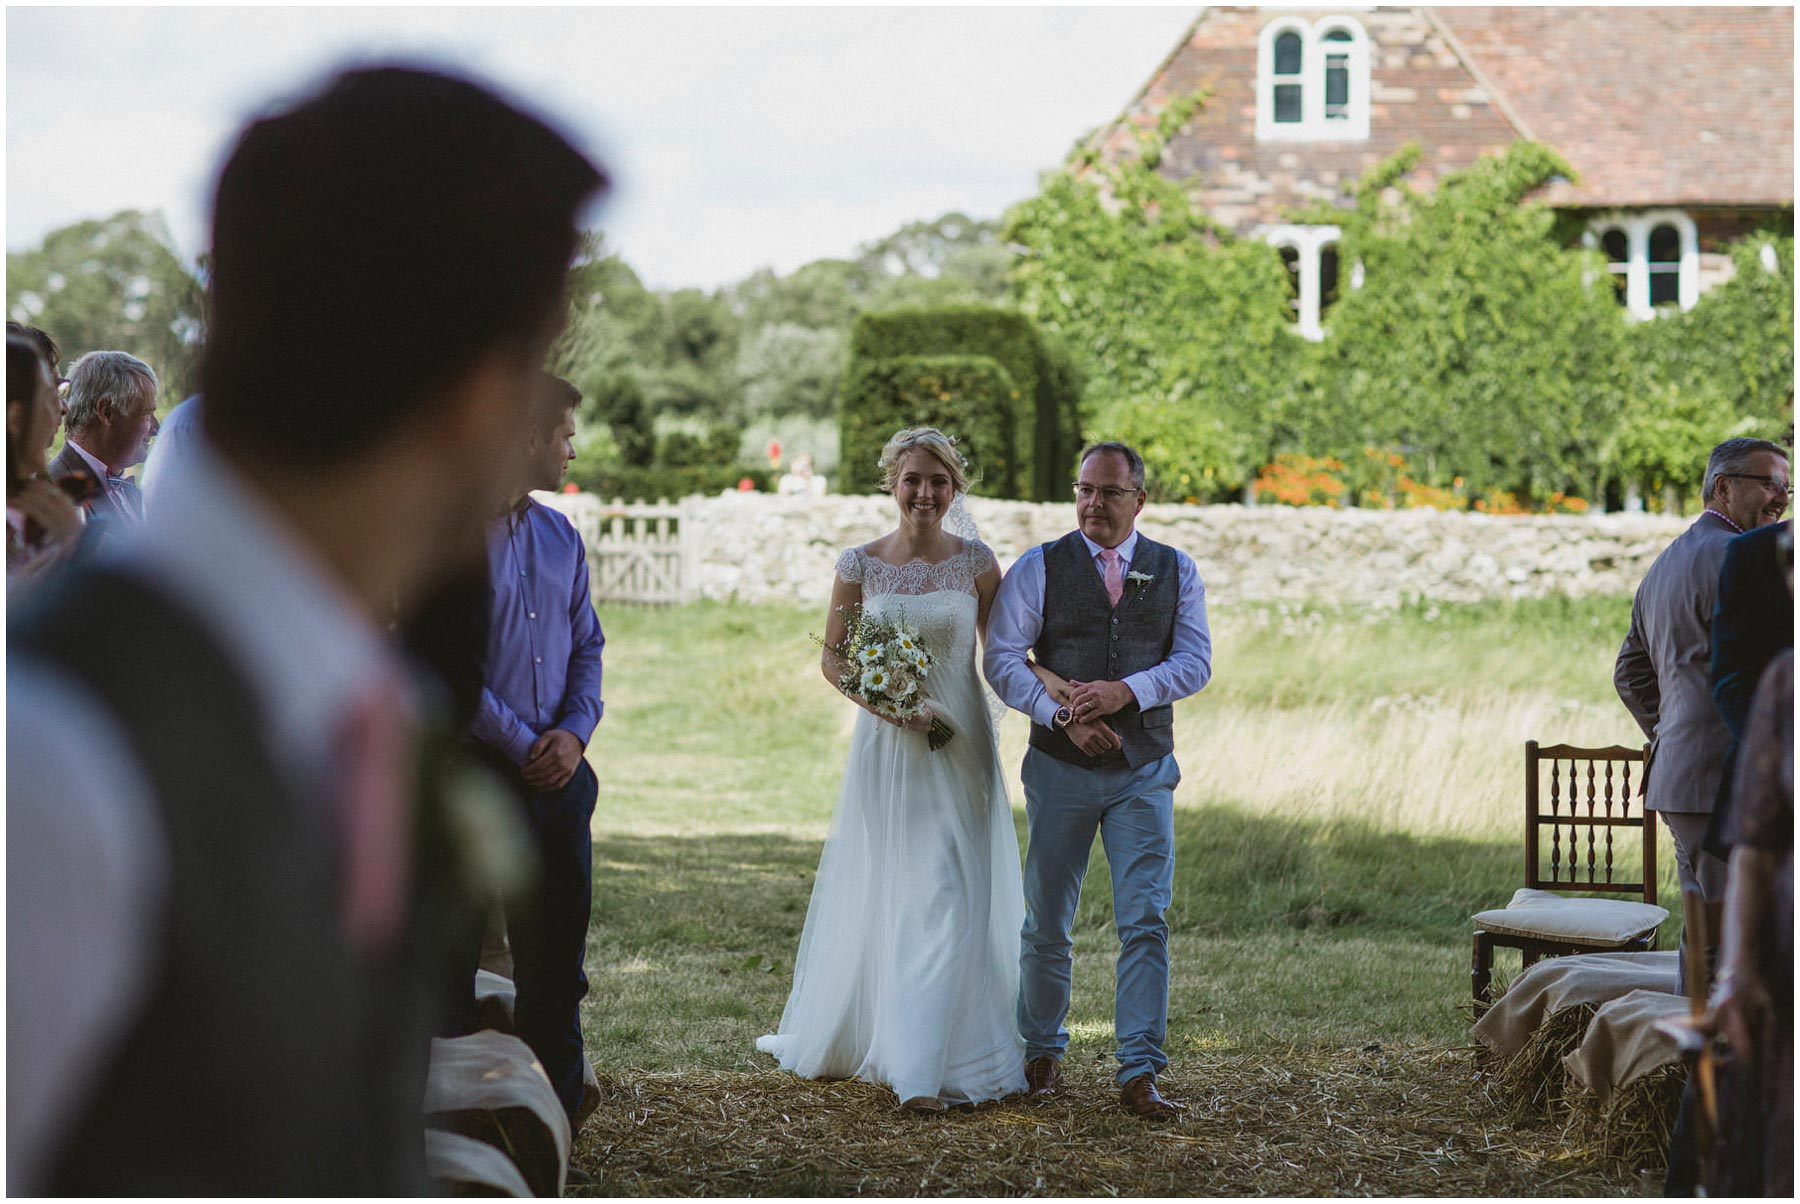 Kent-Festival-Tipi-wedding-photography_0060